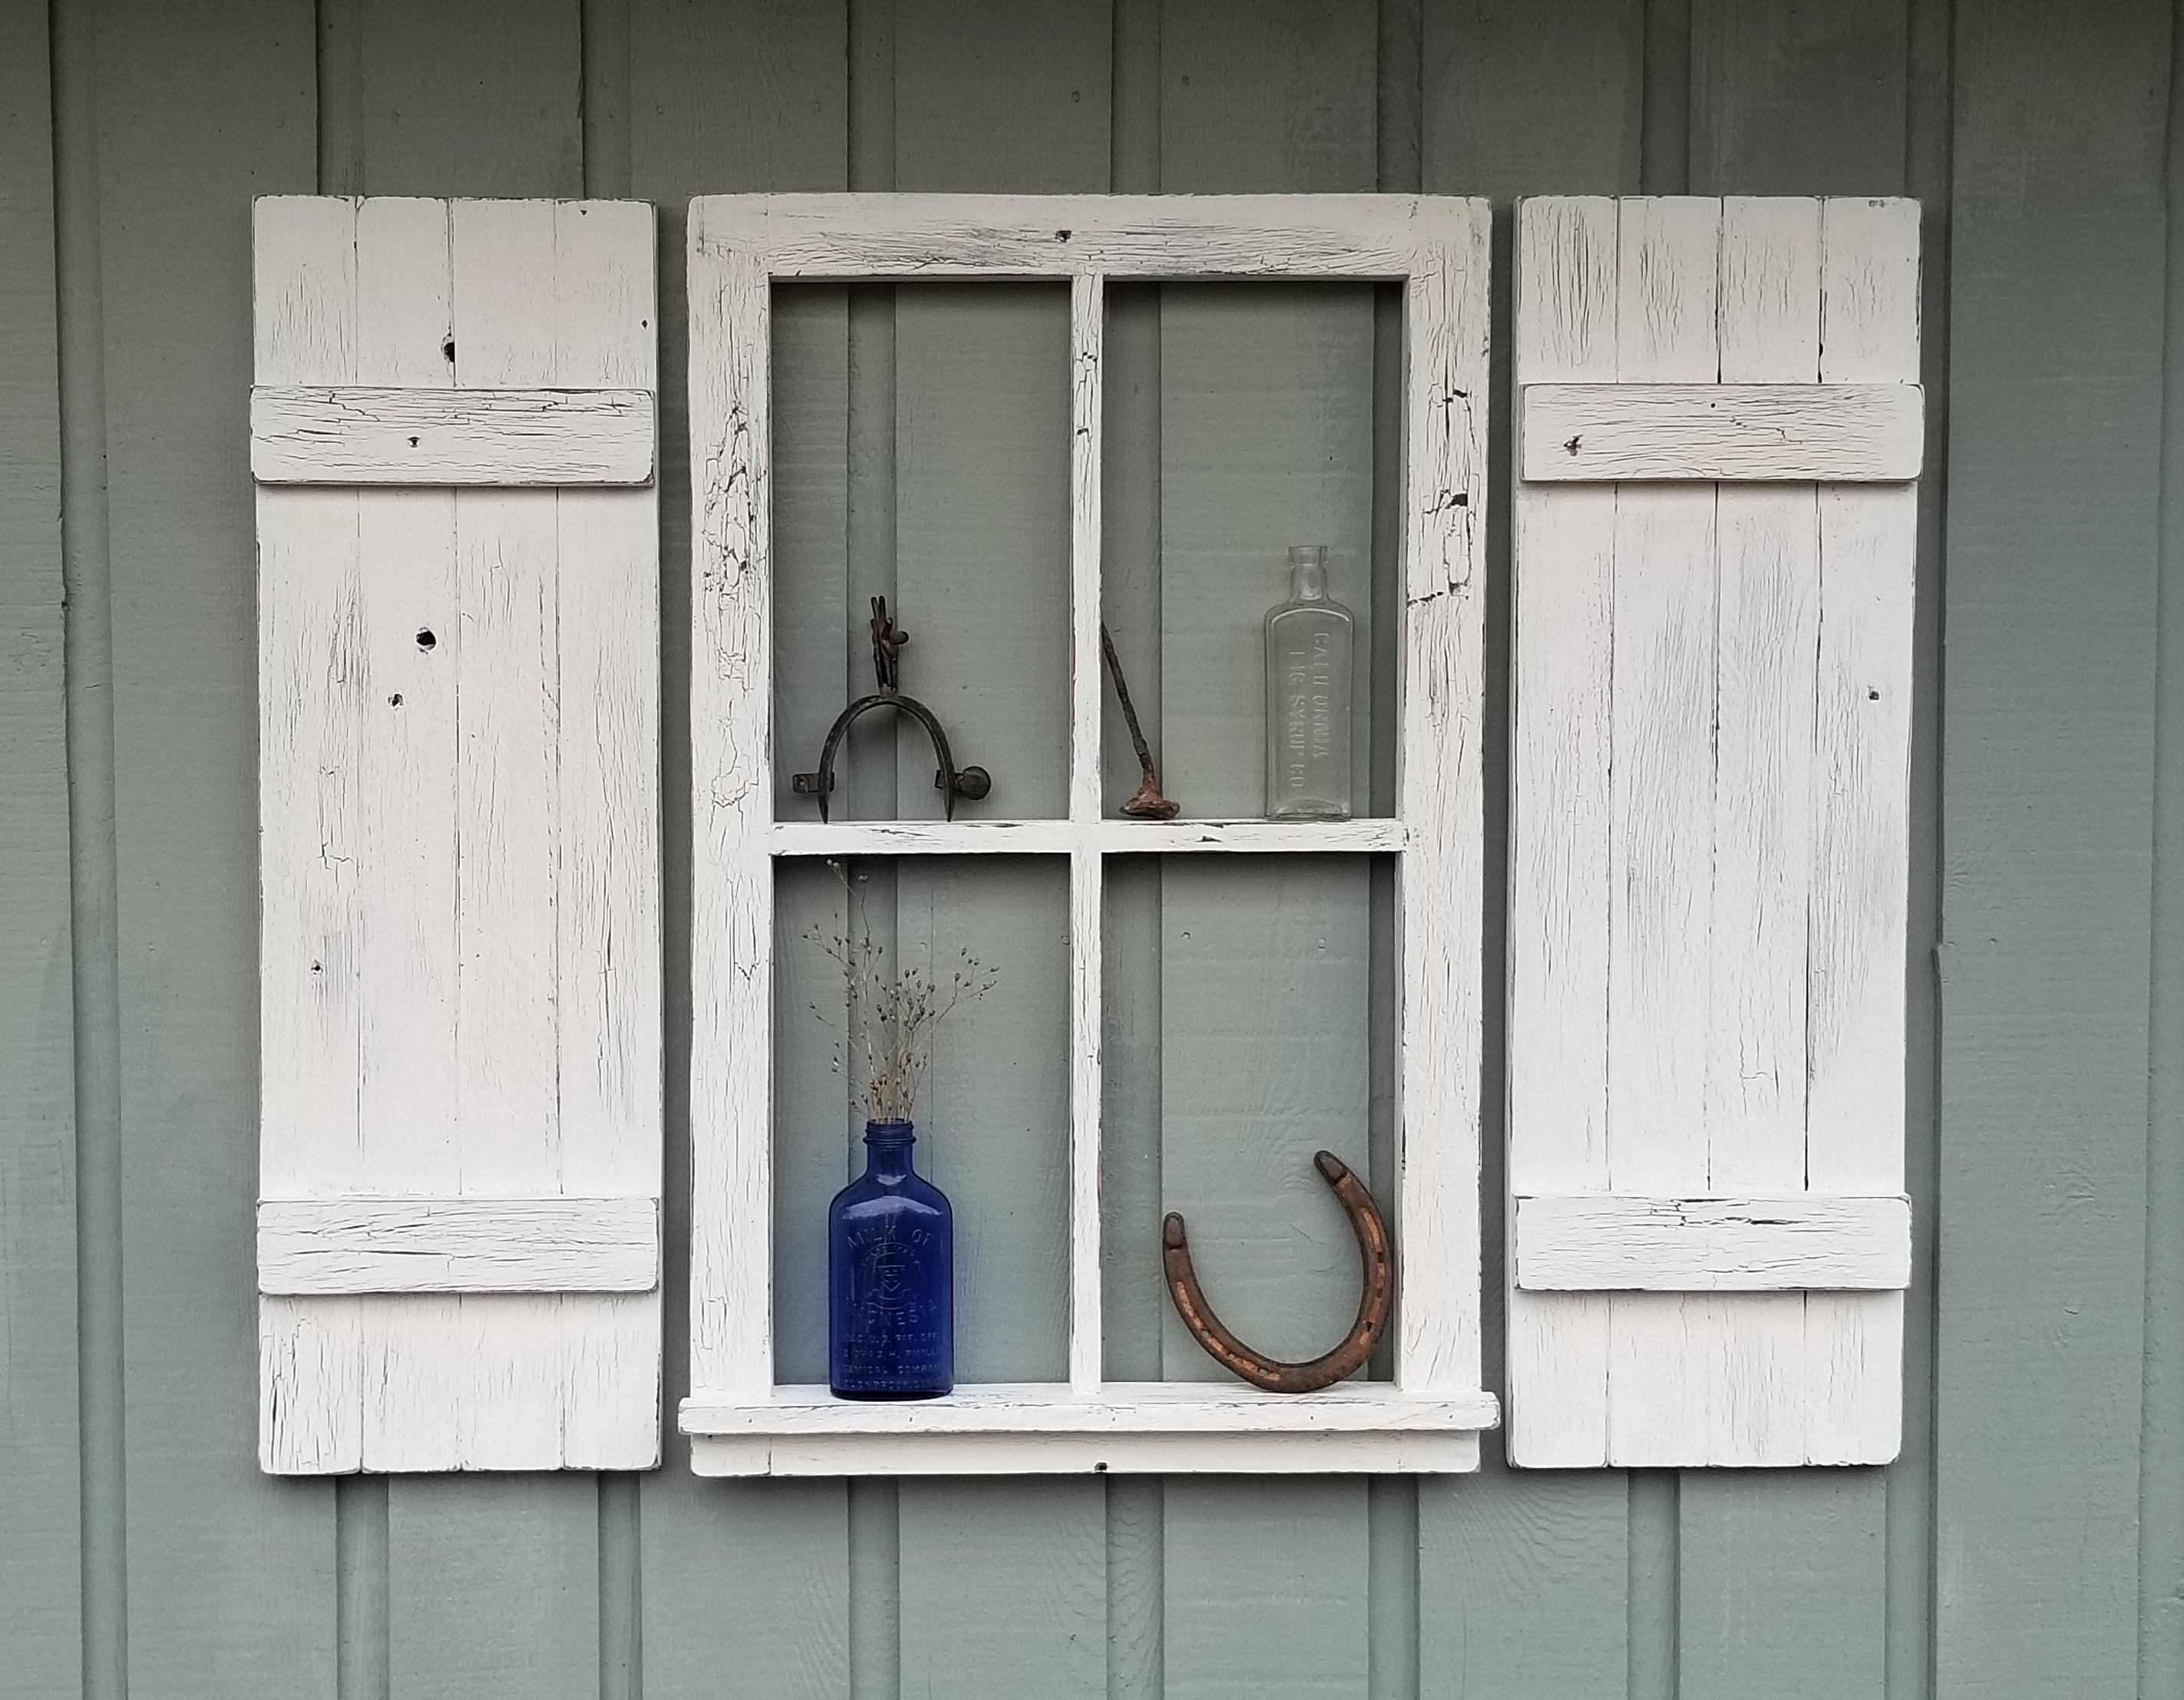 Rustic Wood Shutters With Window Vintage Shutters And Window Primitive Shutters Rustic Wall Decor Farmhouse Decor Shelf Shutter